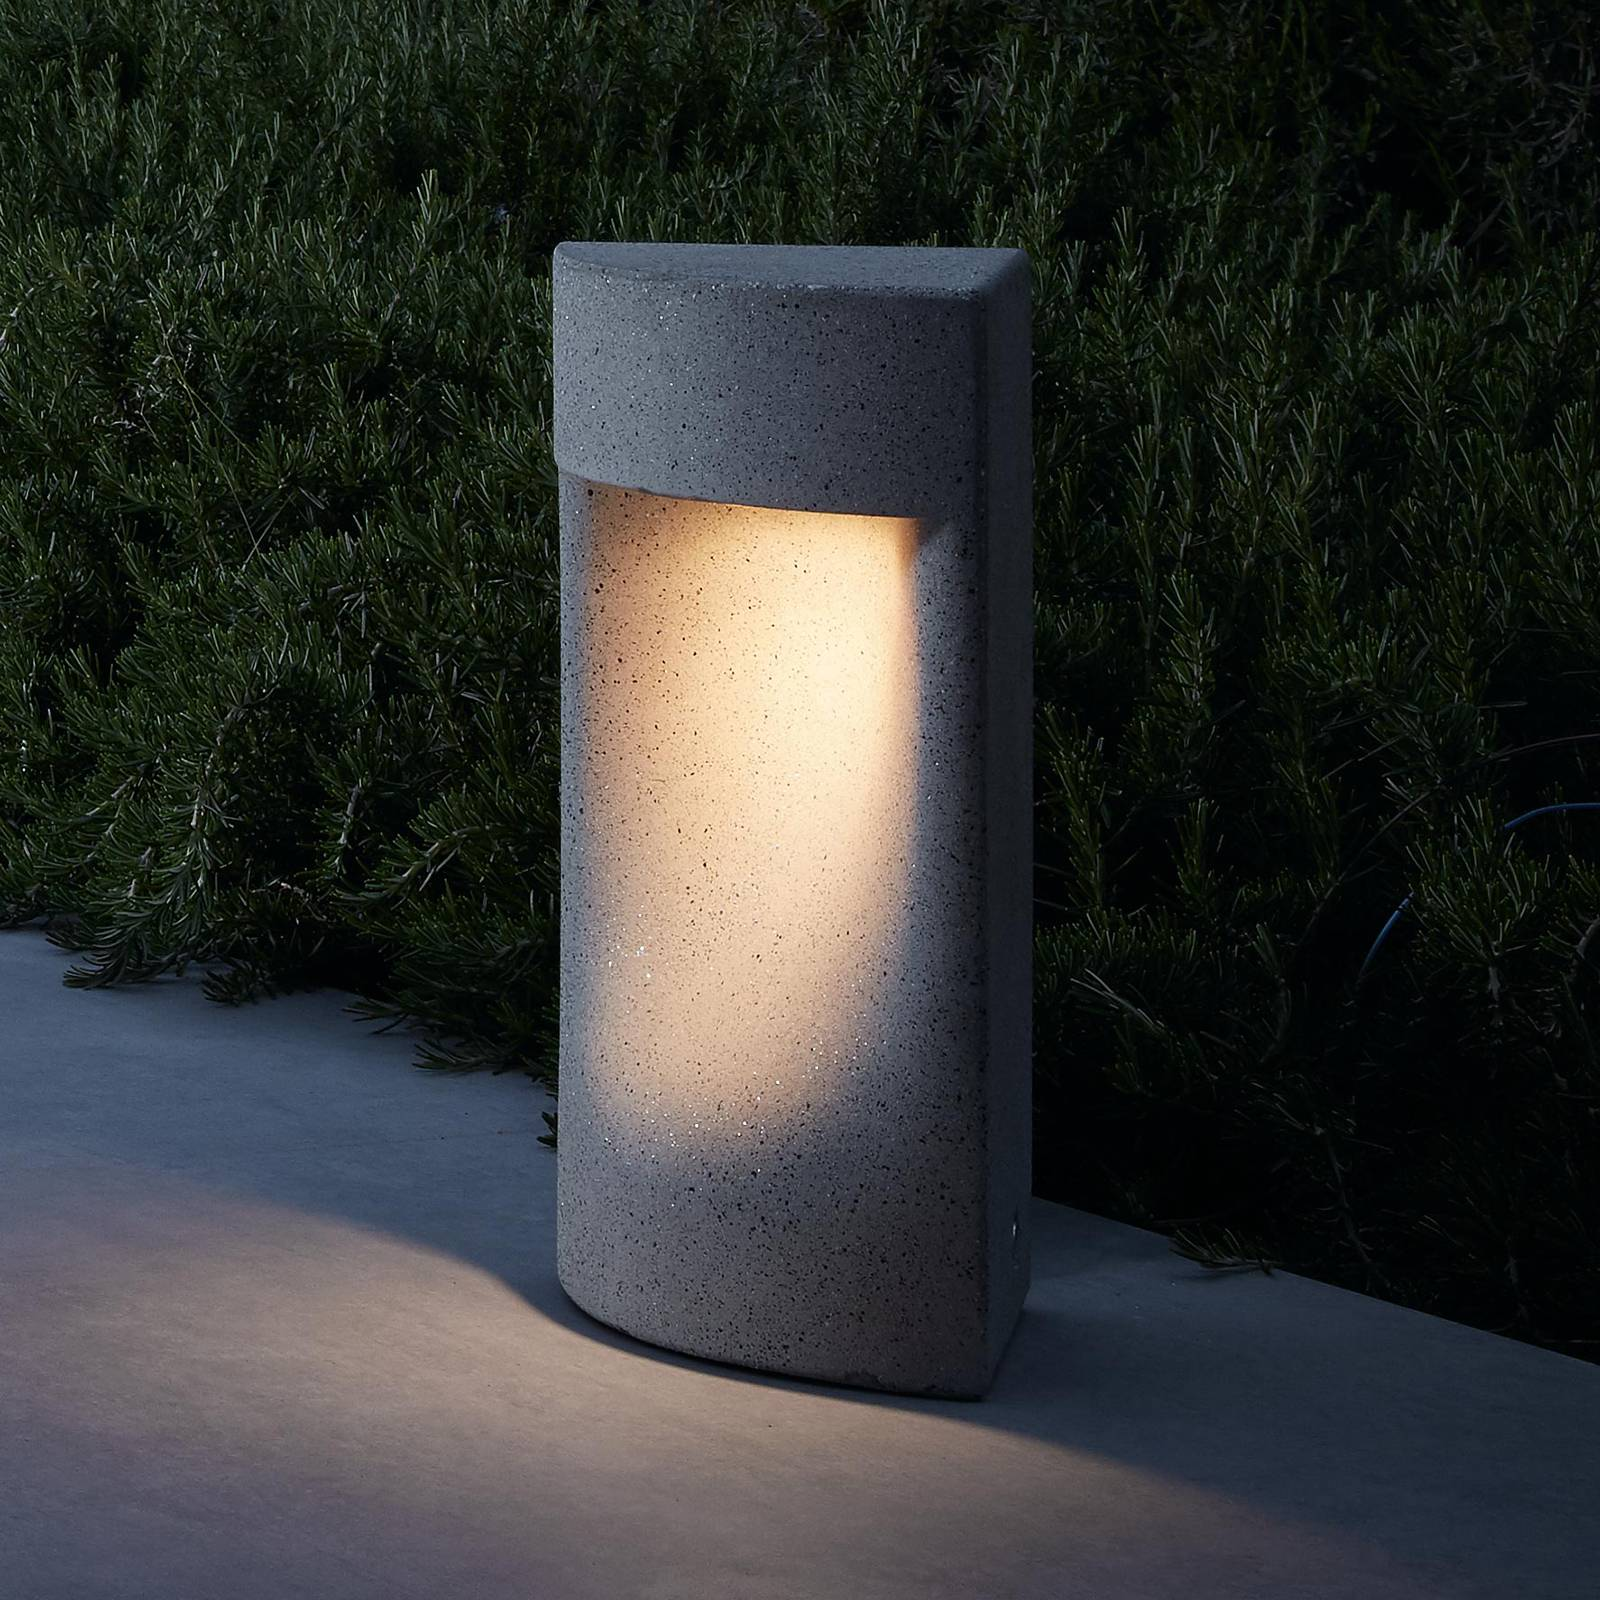 Bover Moai B/35 LED-pollarivalaisin, korkeus 35 cm